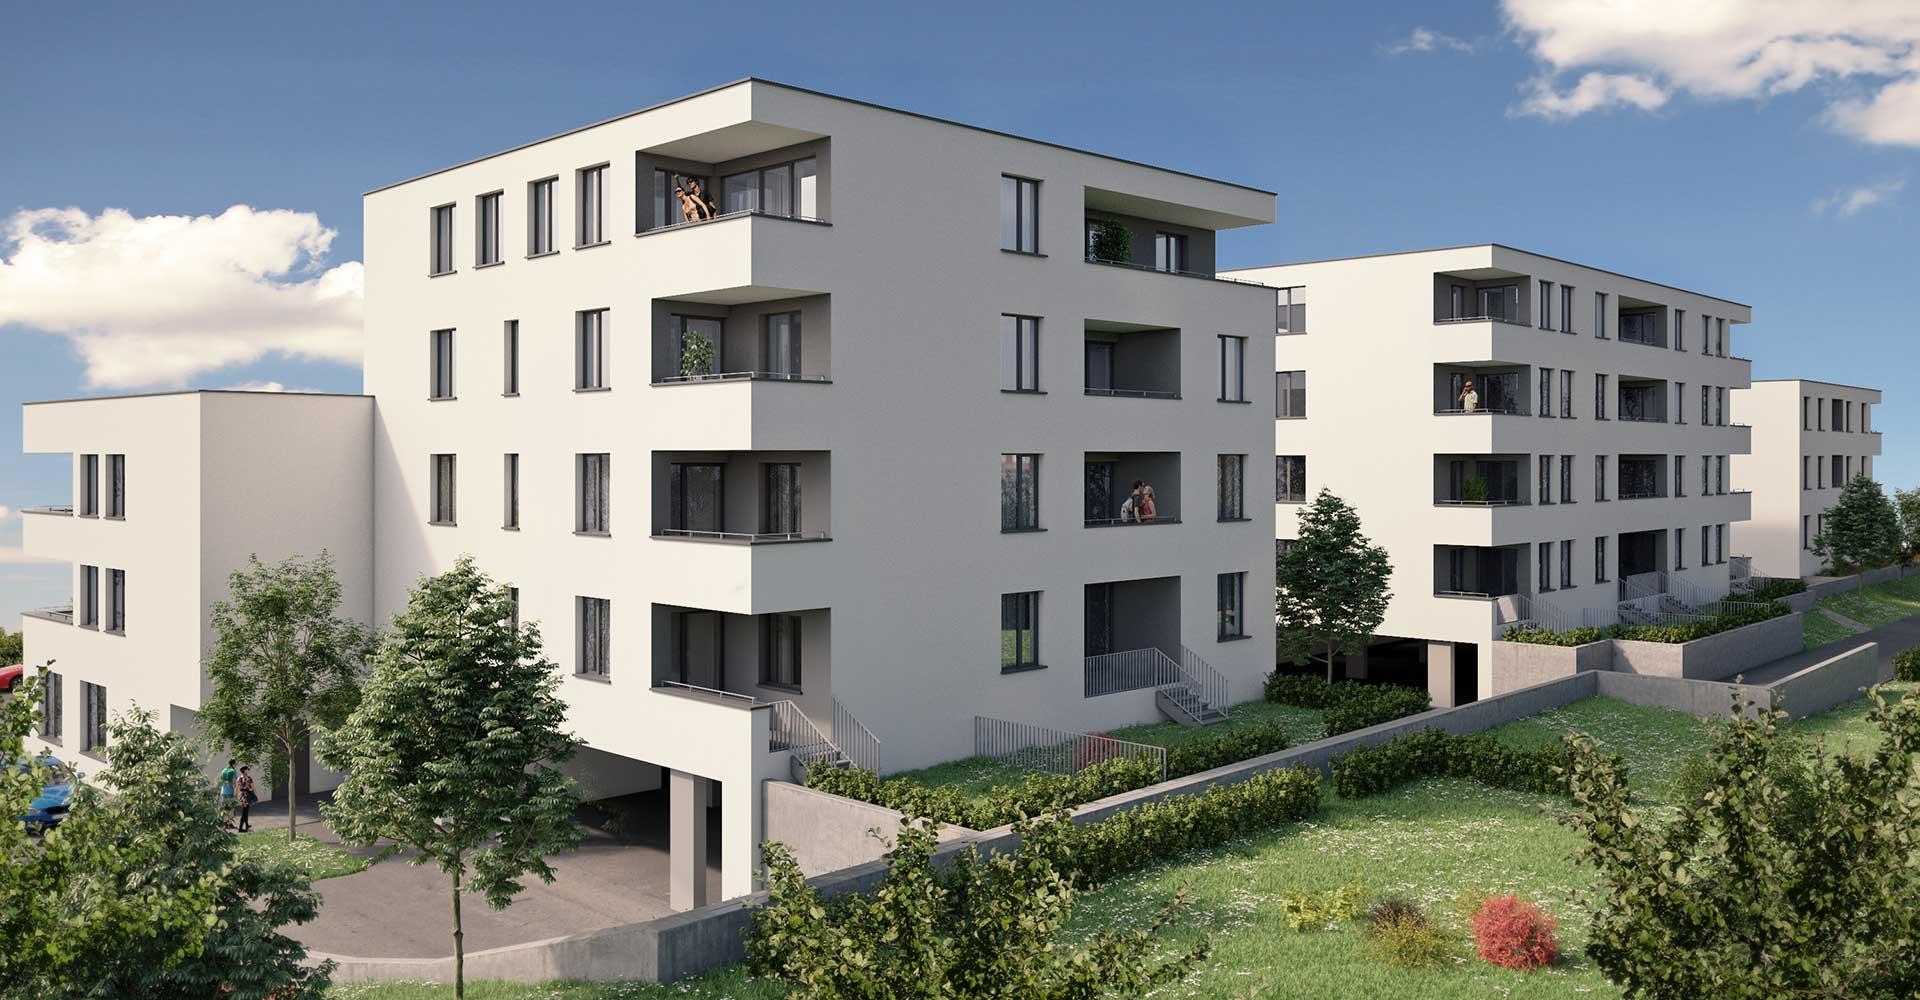 Objekt Mühlwangstrasse Gmunden